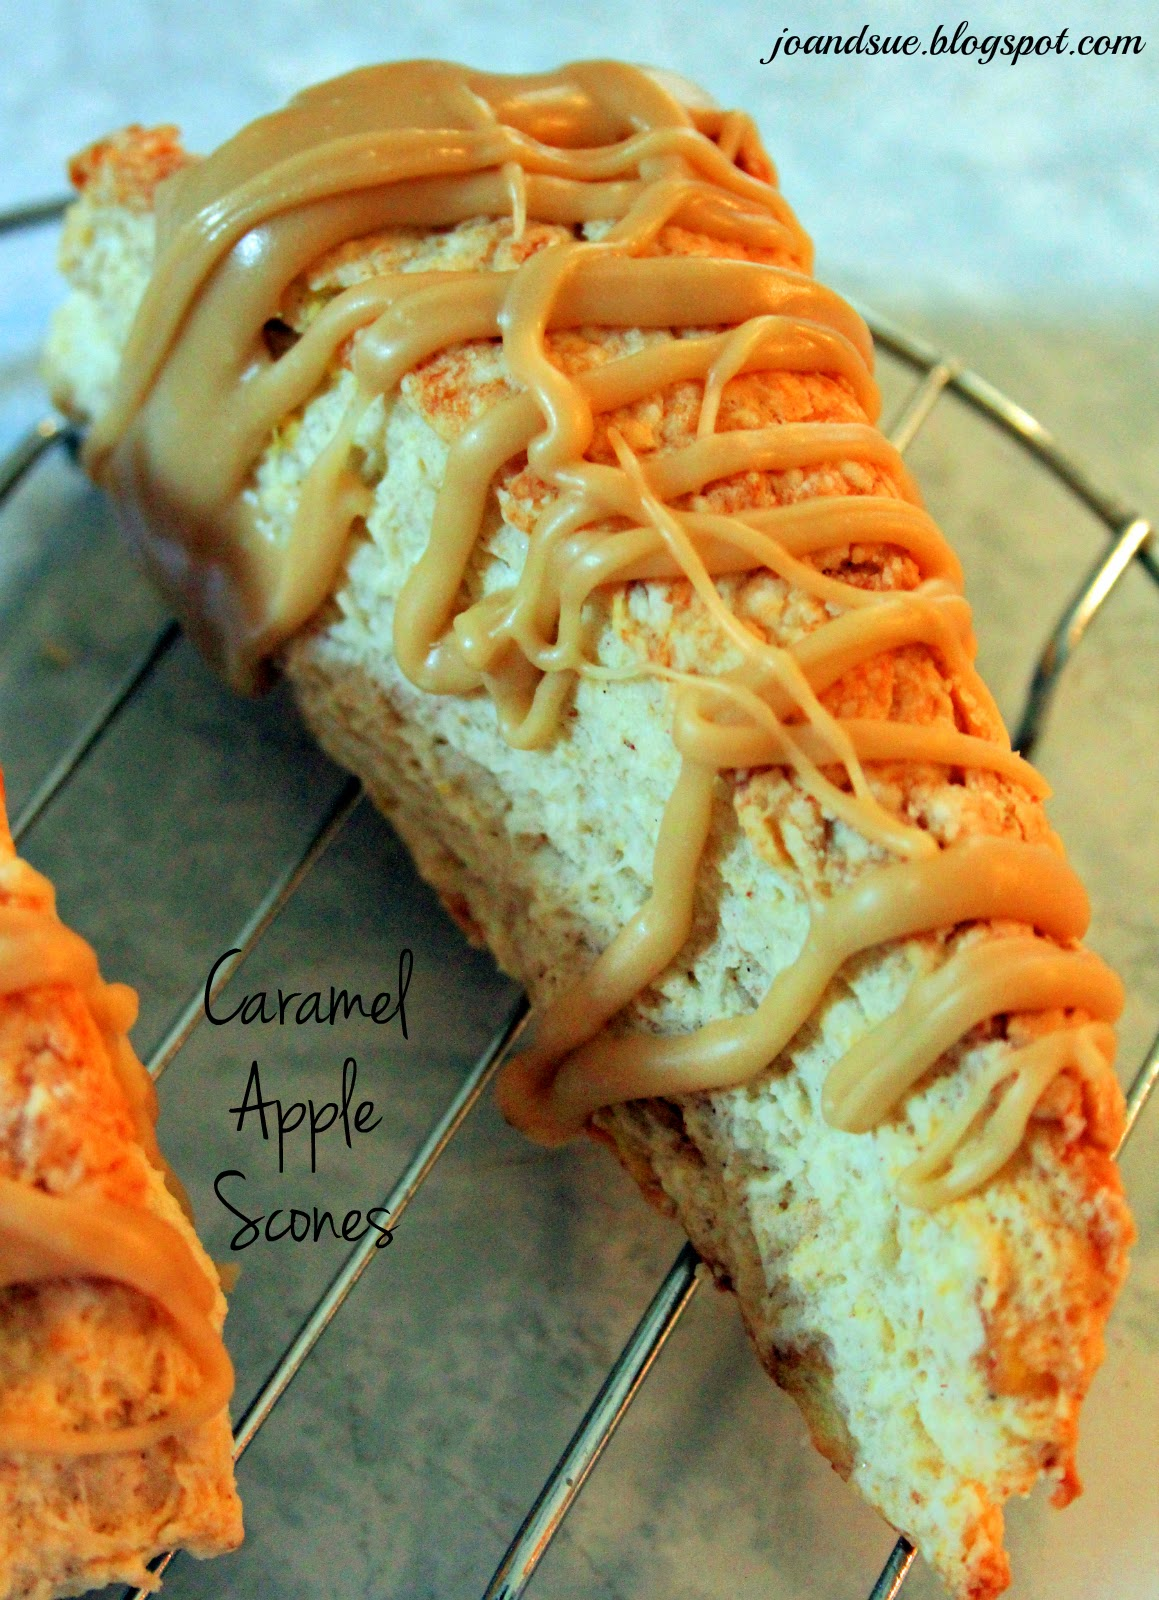 Jo and Sue: Caramel Apple Scones